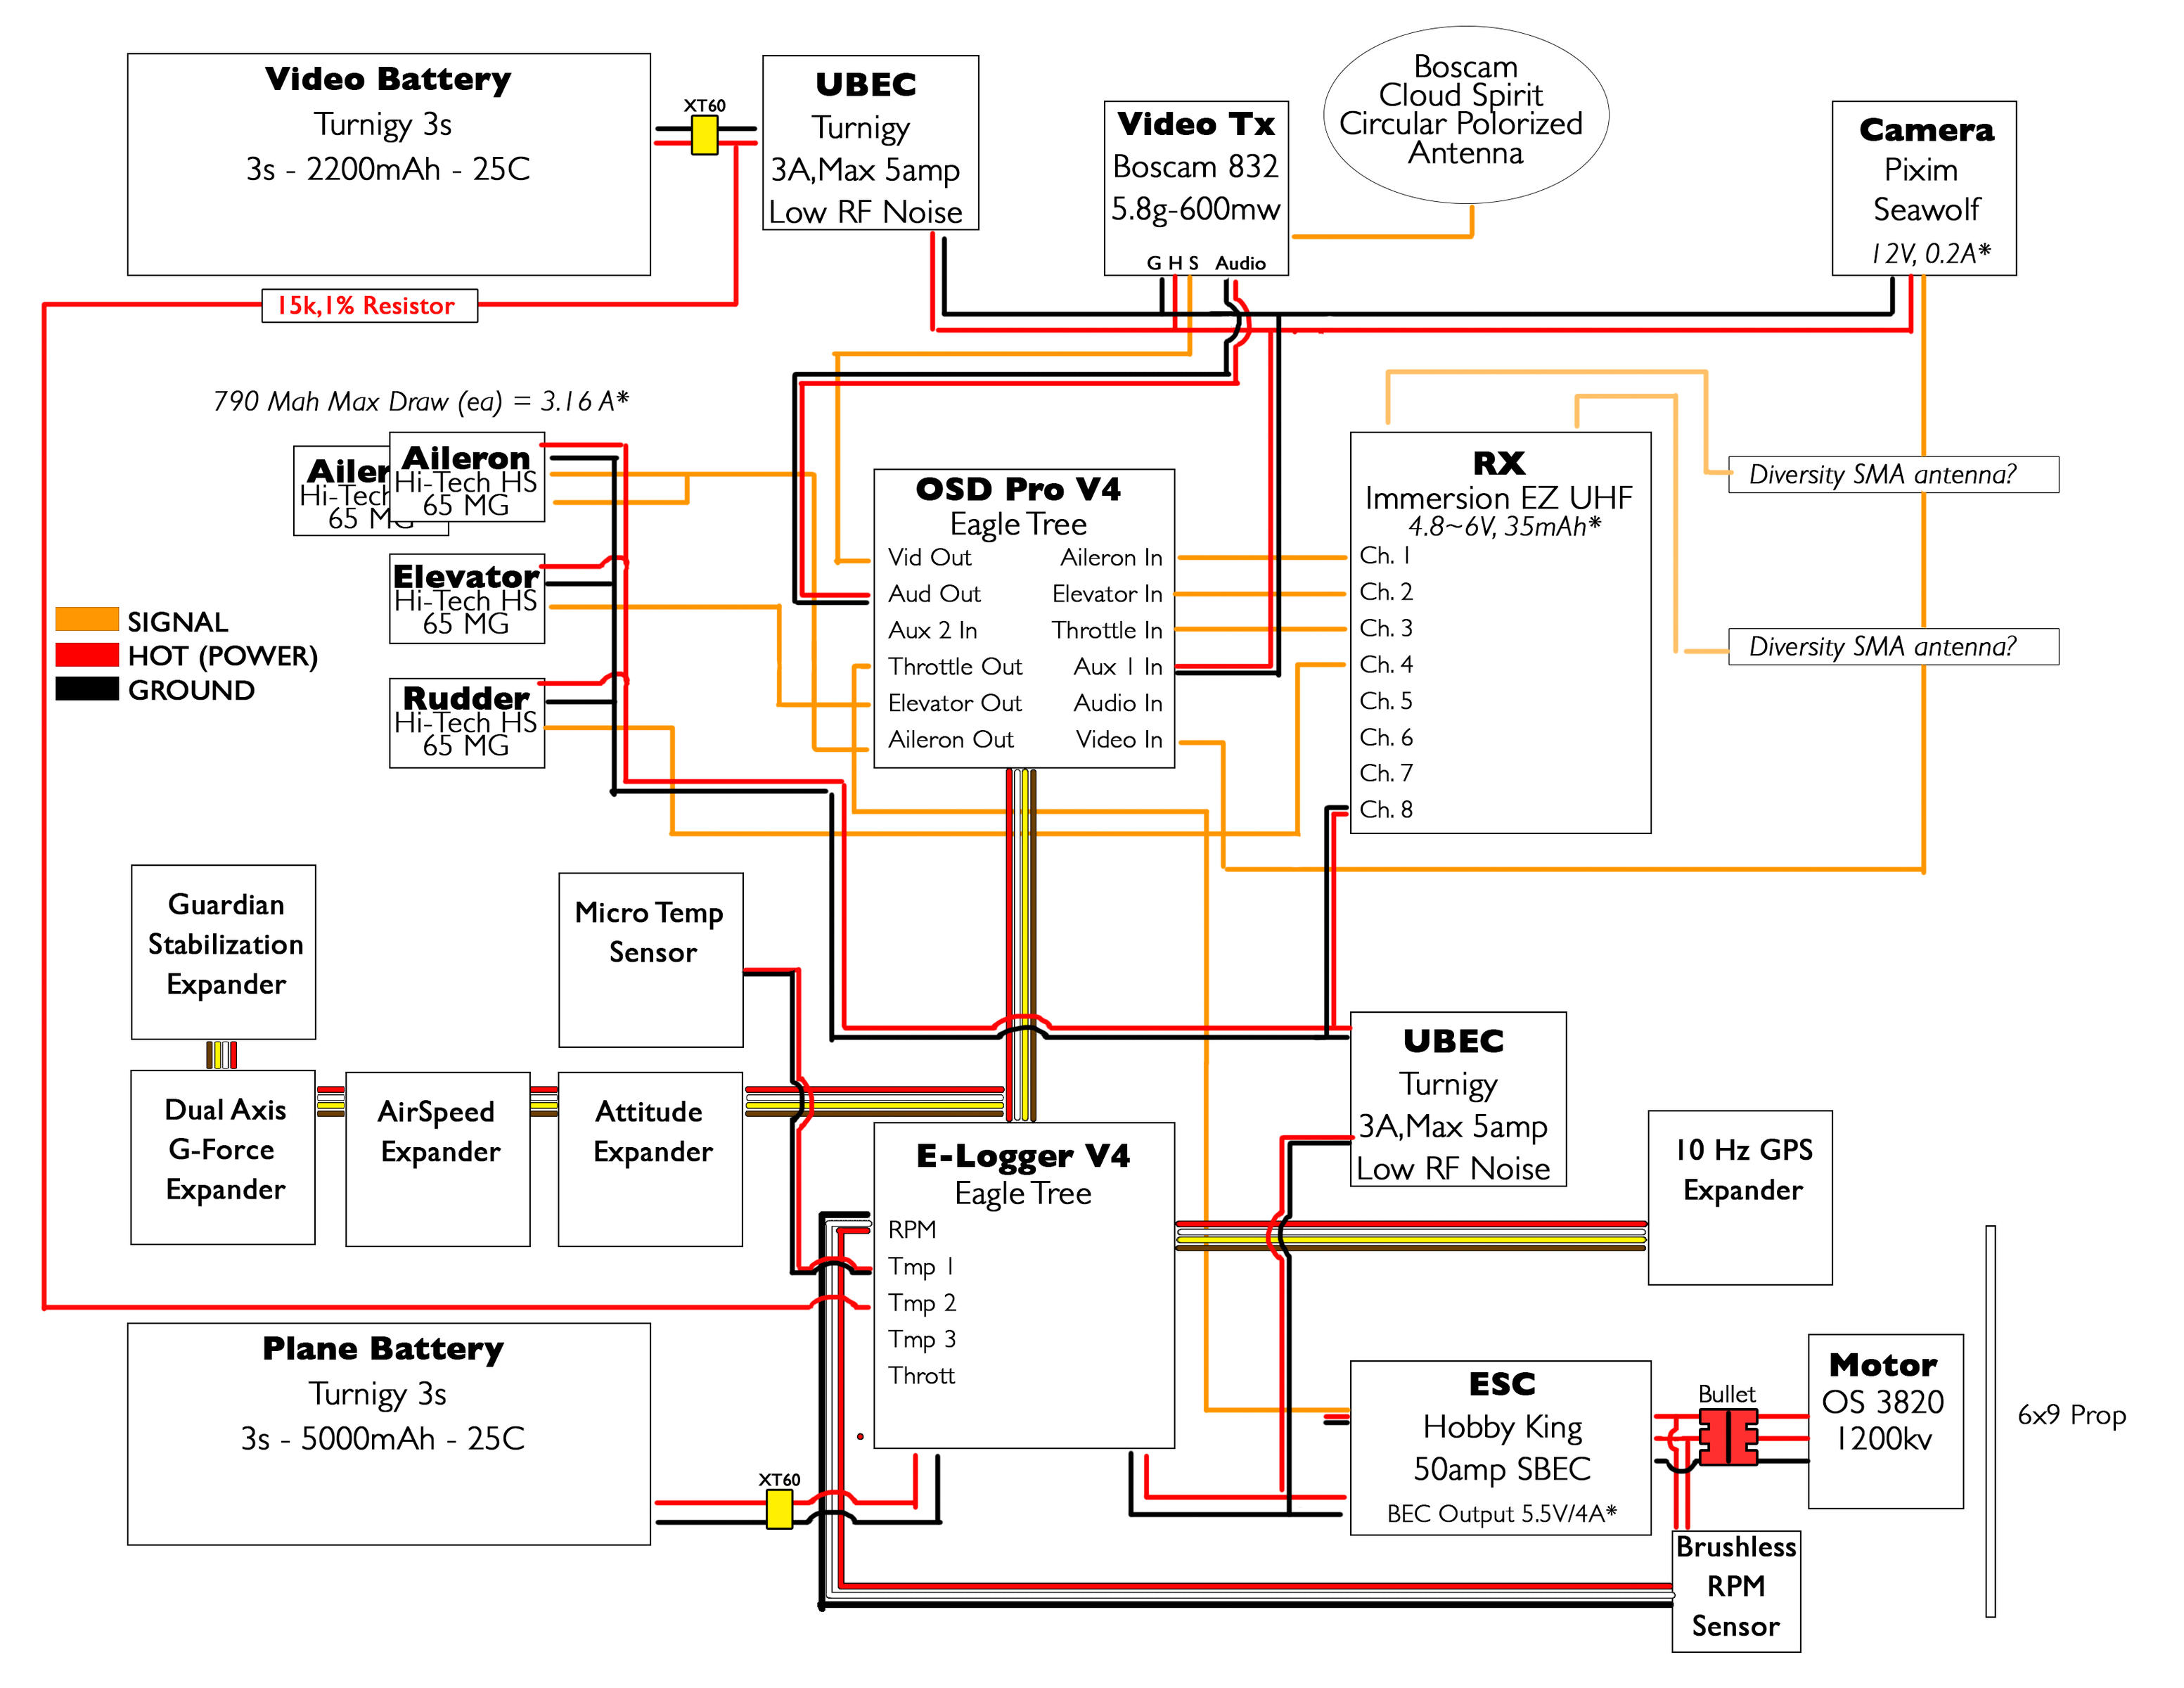 harris m7300 wiring diagram harris maestro console wiring harris pool pump wiring  diagram harris flotebote wiring diagram